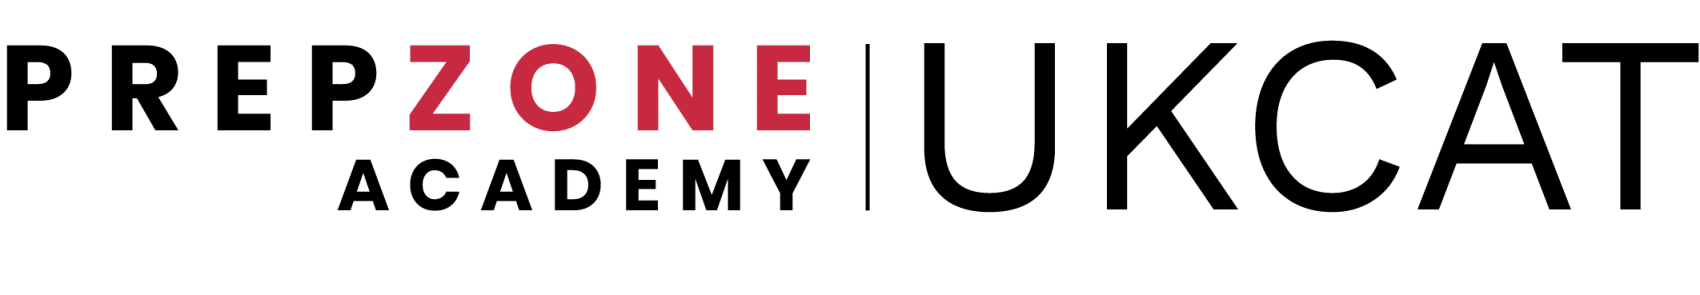 Prep Zone Academy | UKCAT